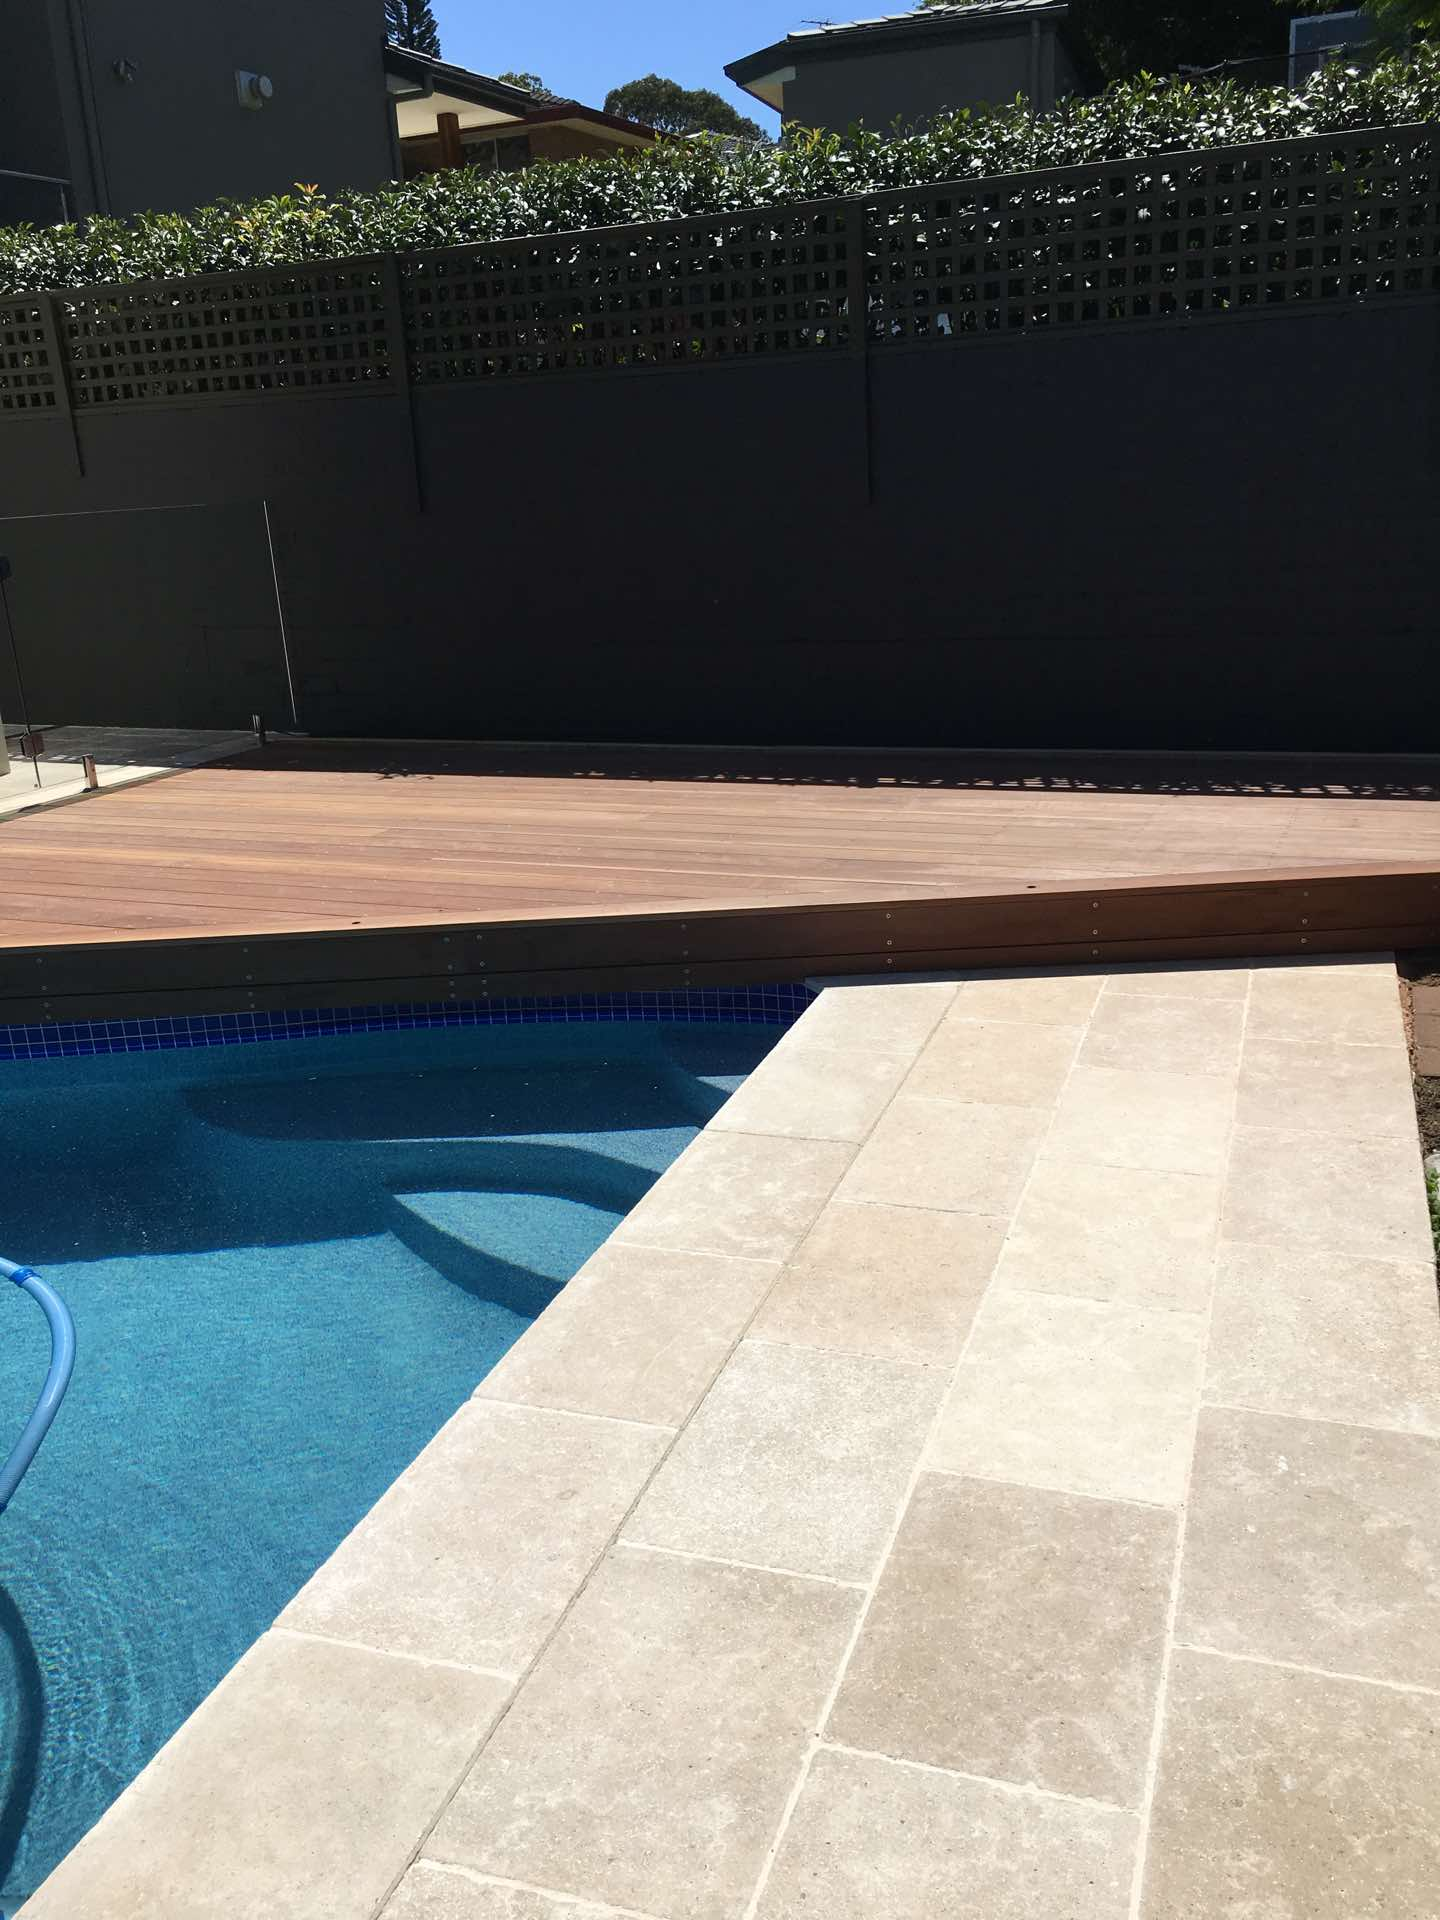 140 x 25 pacific jarrah decks for a pool renovation. Hunters Hill, NSW